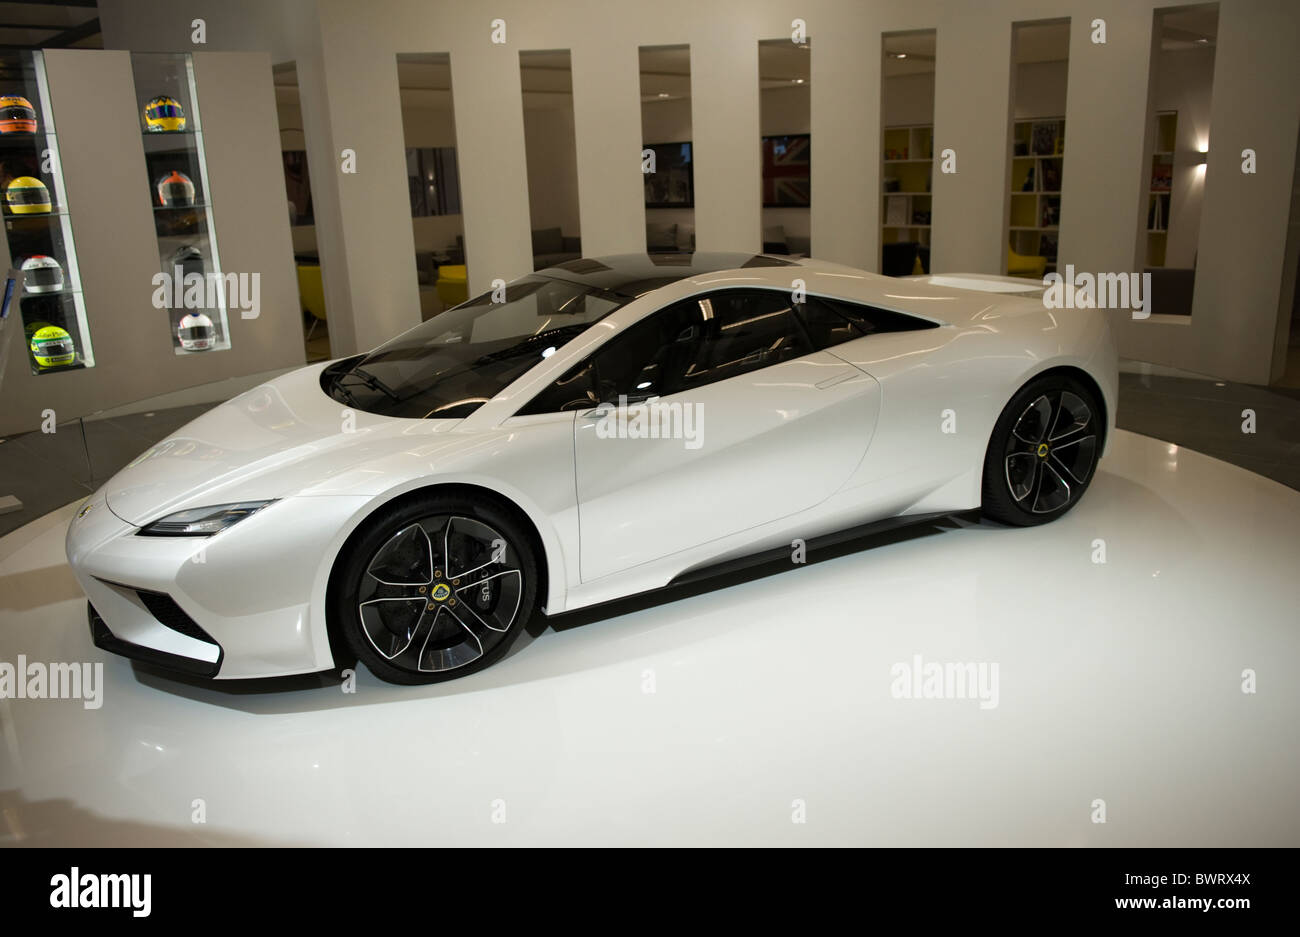 http://c8.alamy.com/comp/BWRX4X/a-lotus-esprit-concept-car-at-the-2010-la-auto-show-los-angeles-california-BWRX4X.jpg